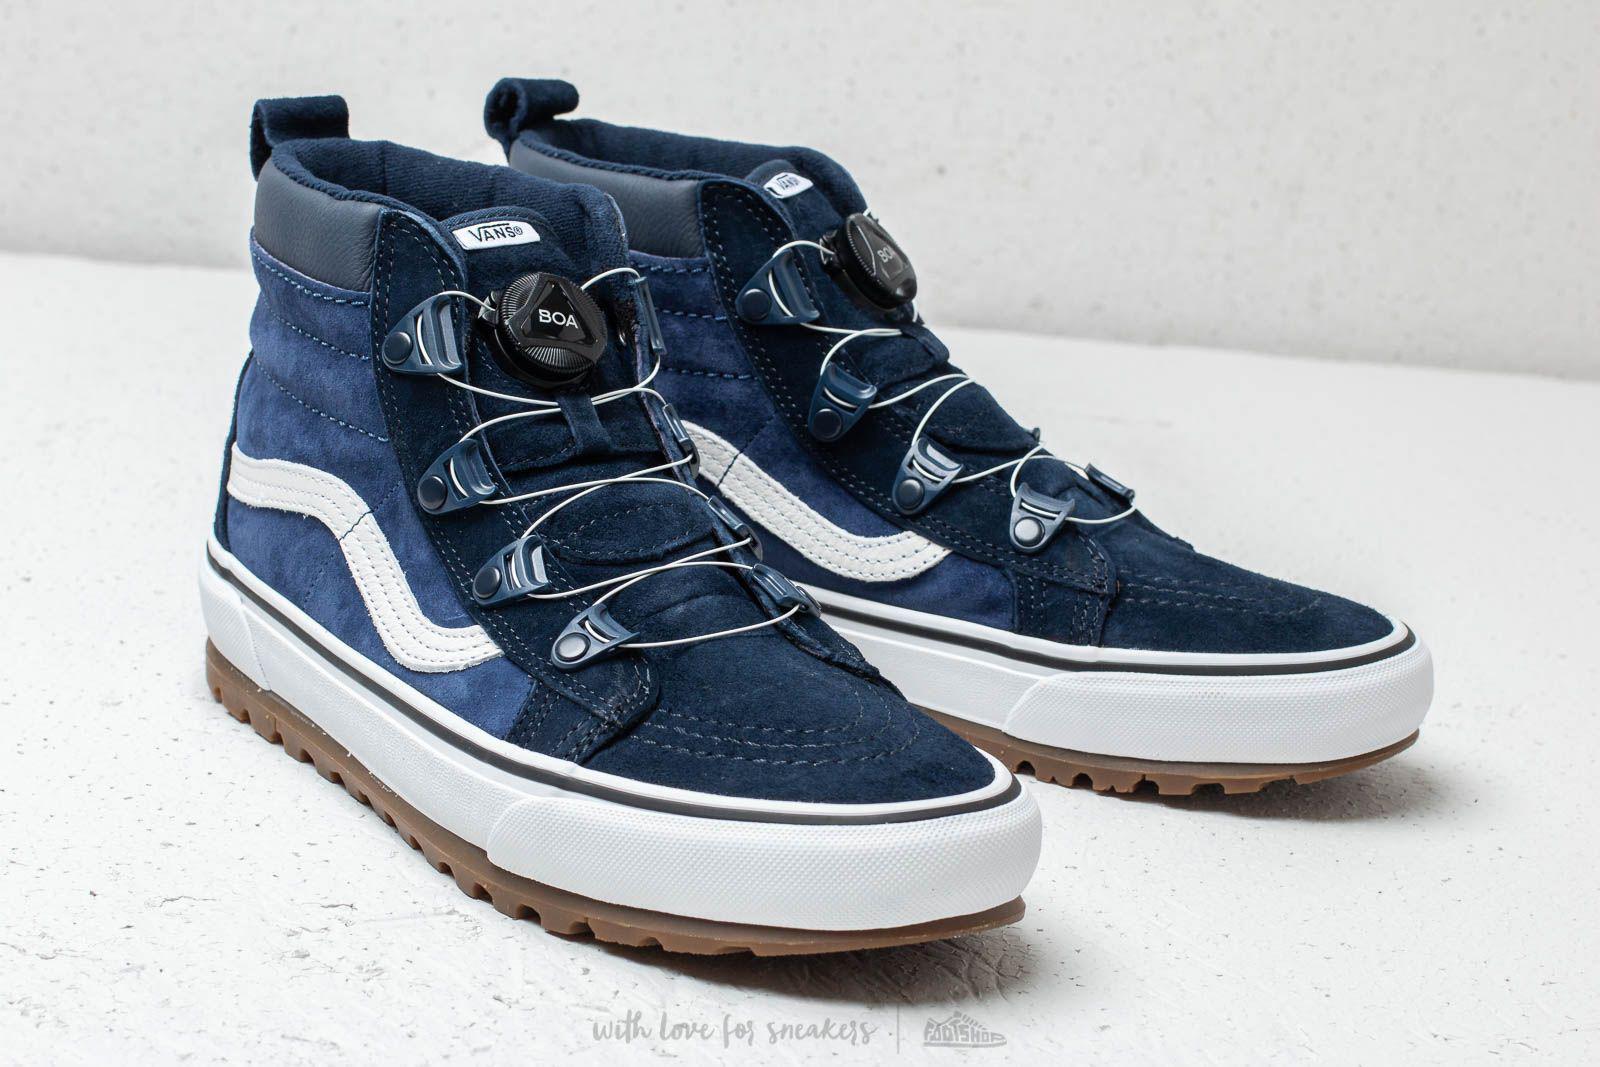 bf4ece1202 Lyst - Vans Sk8-hi Boa (mte) Navy  True White in Blue for Men